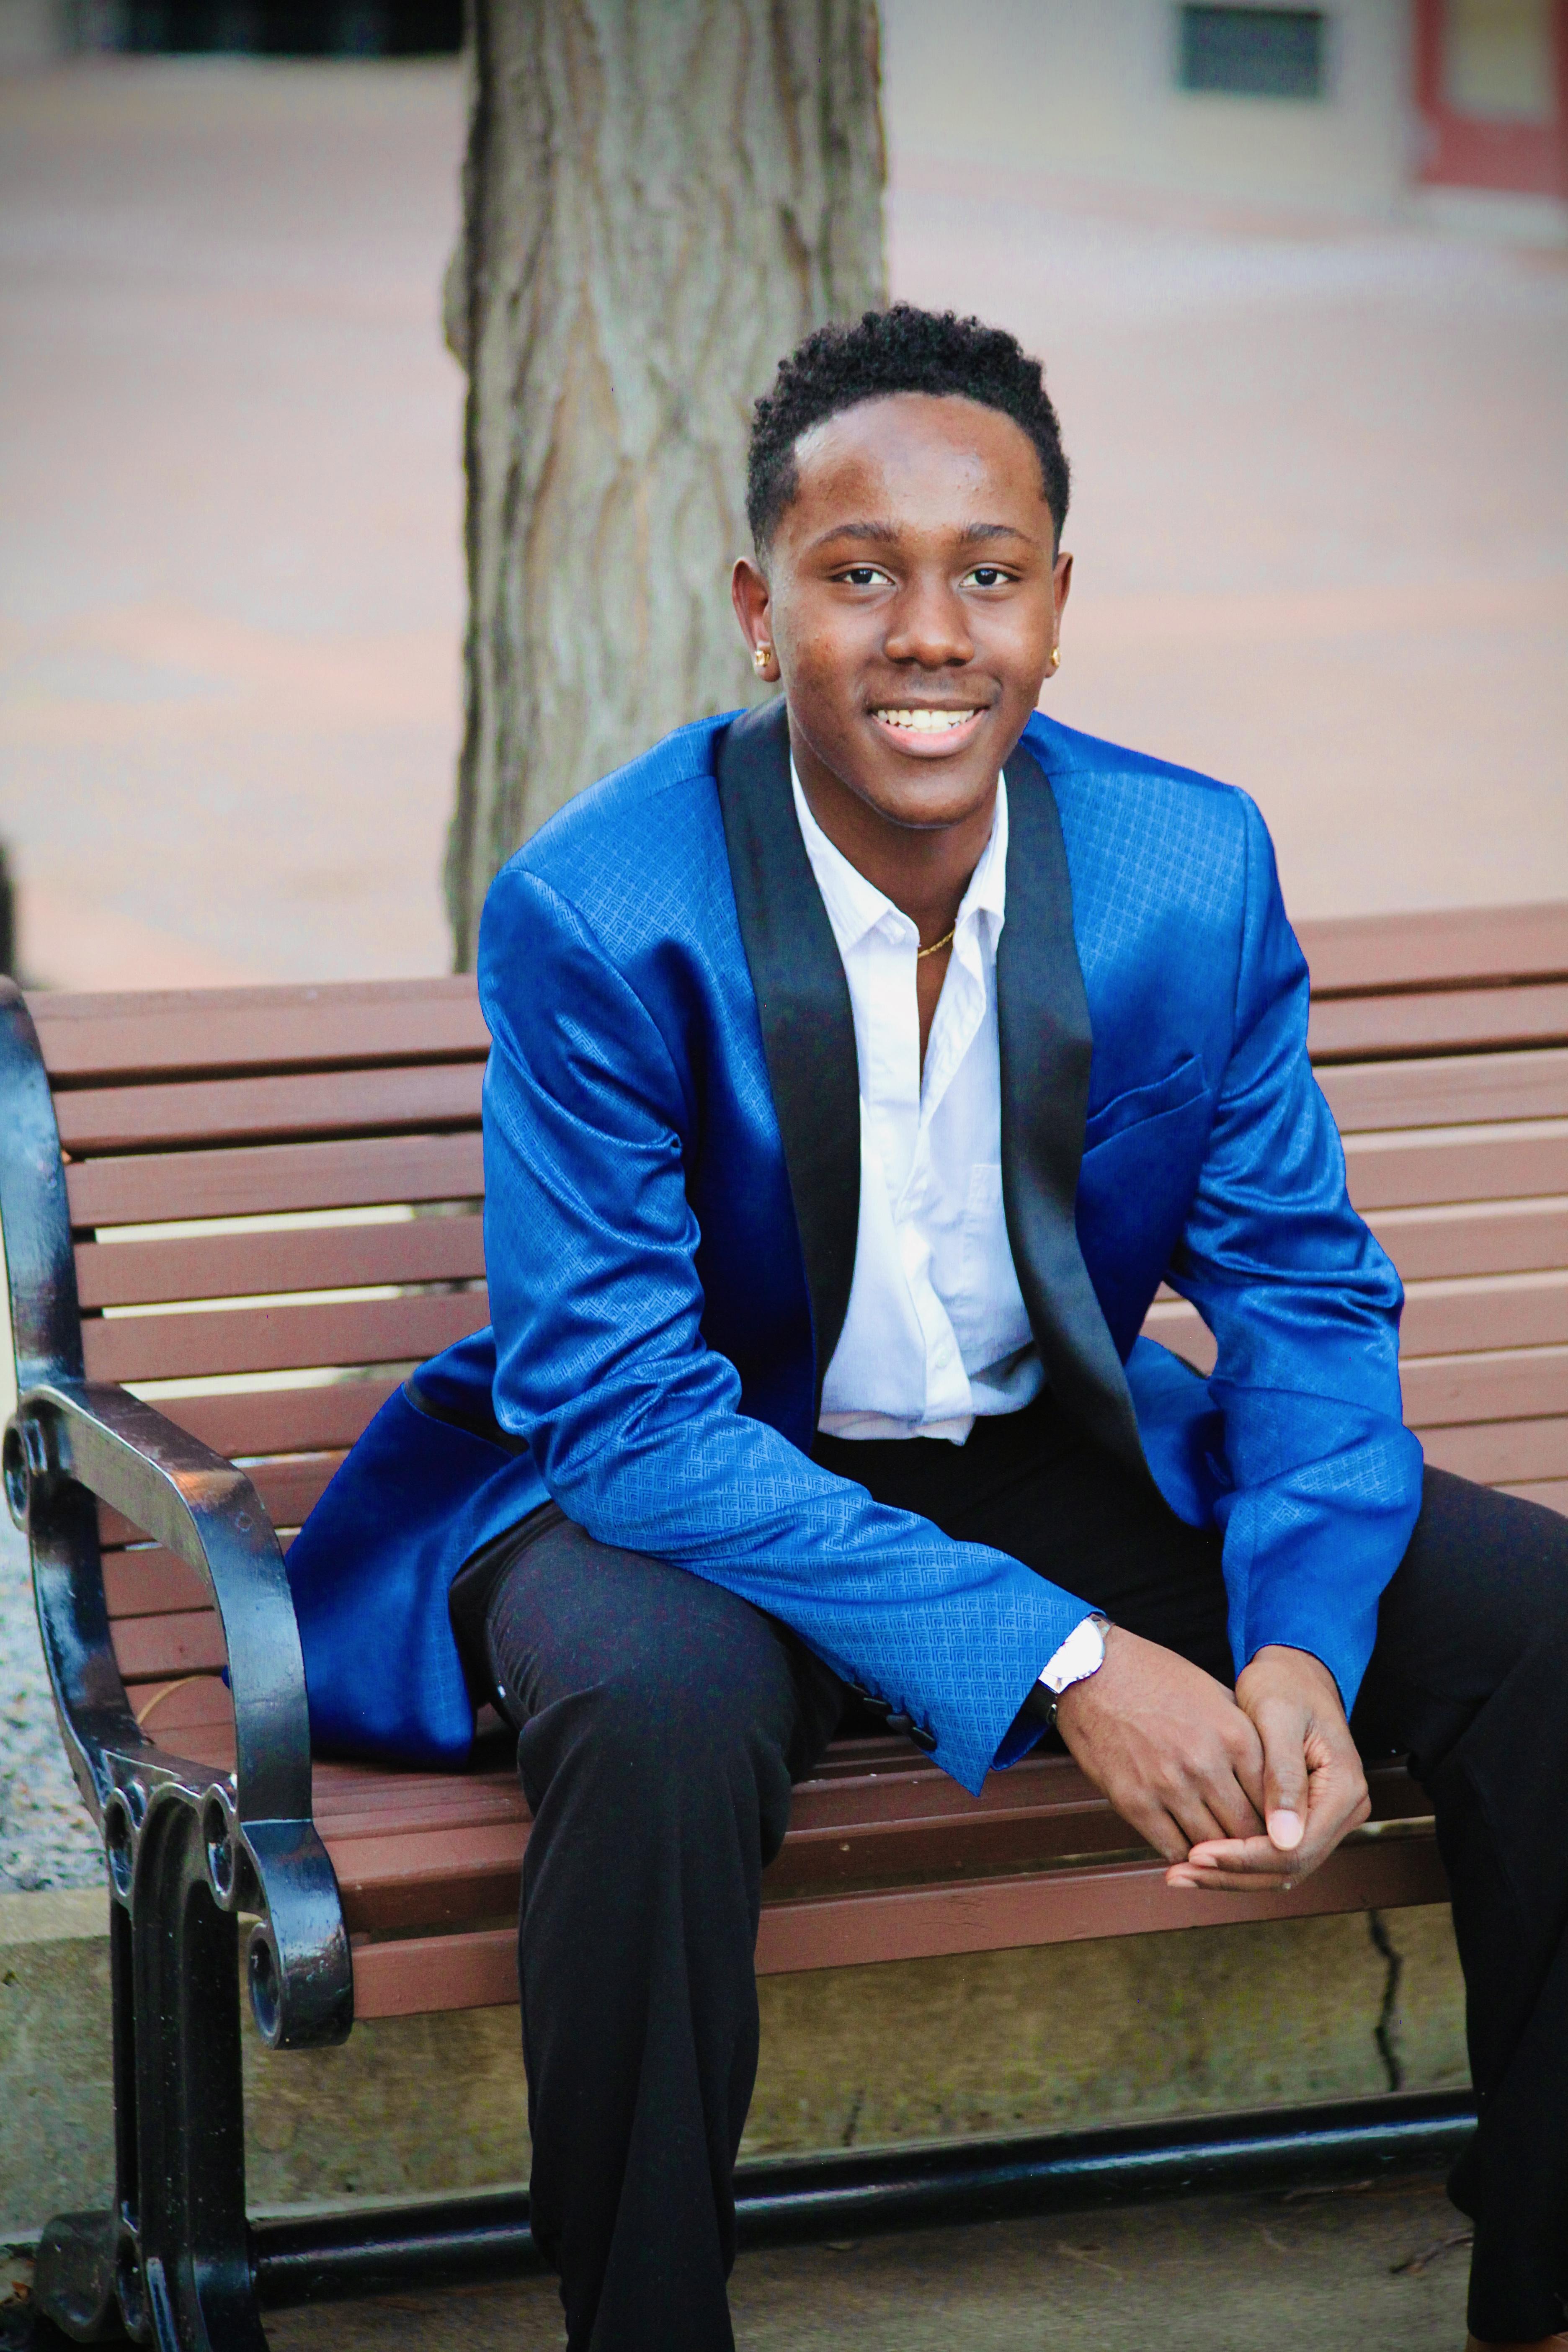 Malik Robinson, Nottingham High School senior class president, created Nottingham's annual Black History Month presentation with his classmate Hawa Ahmed in 2019.